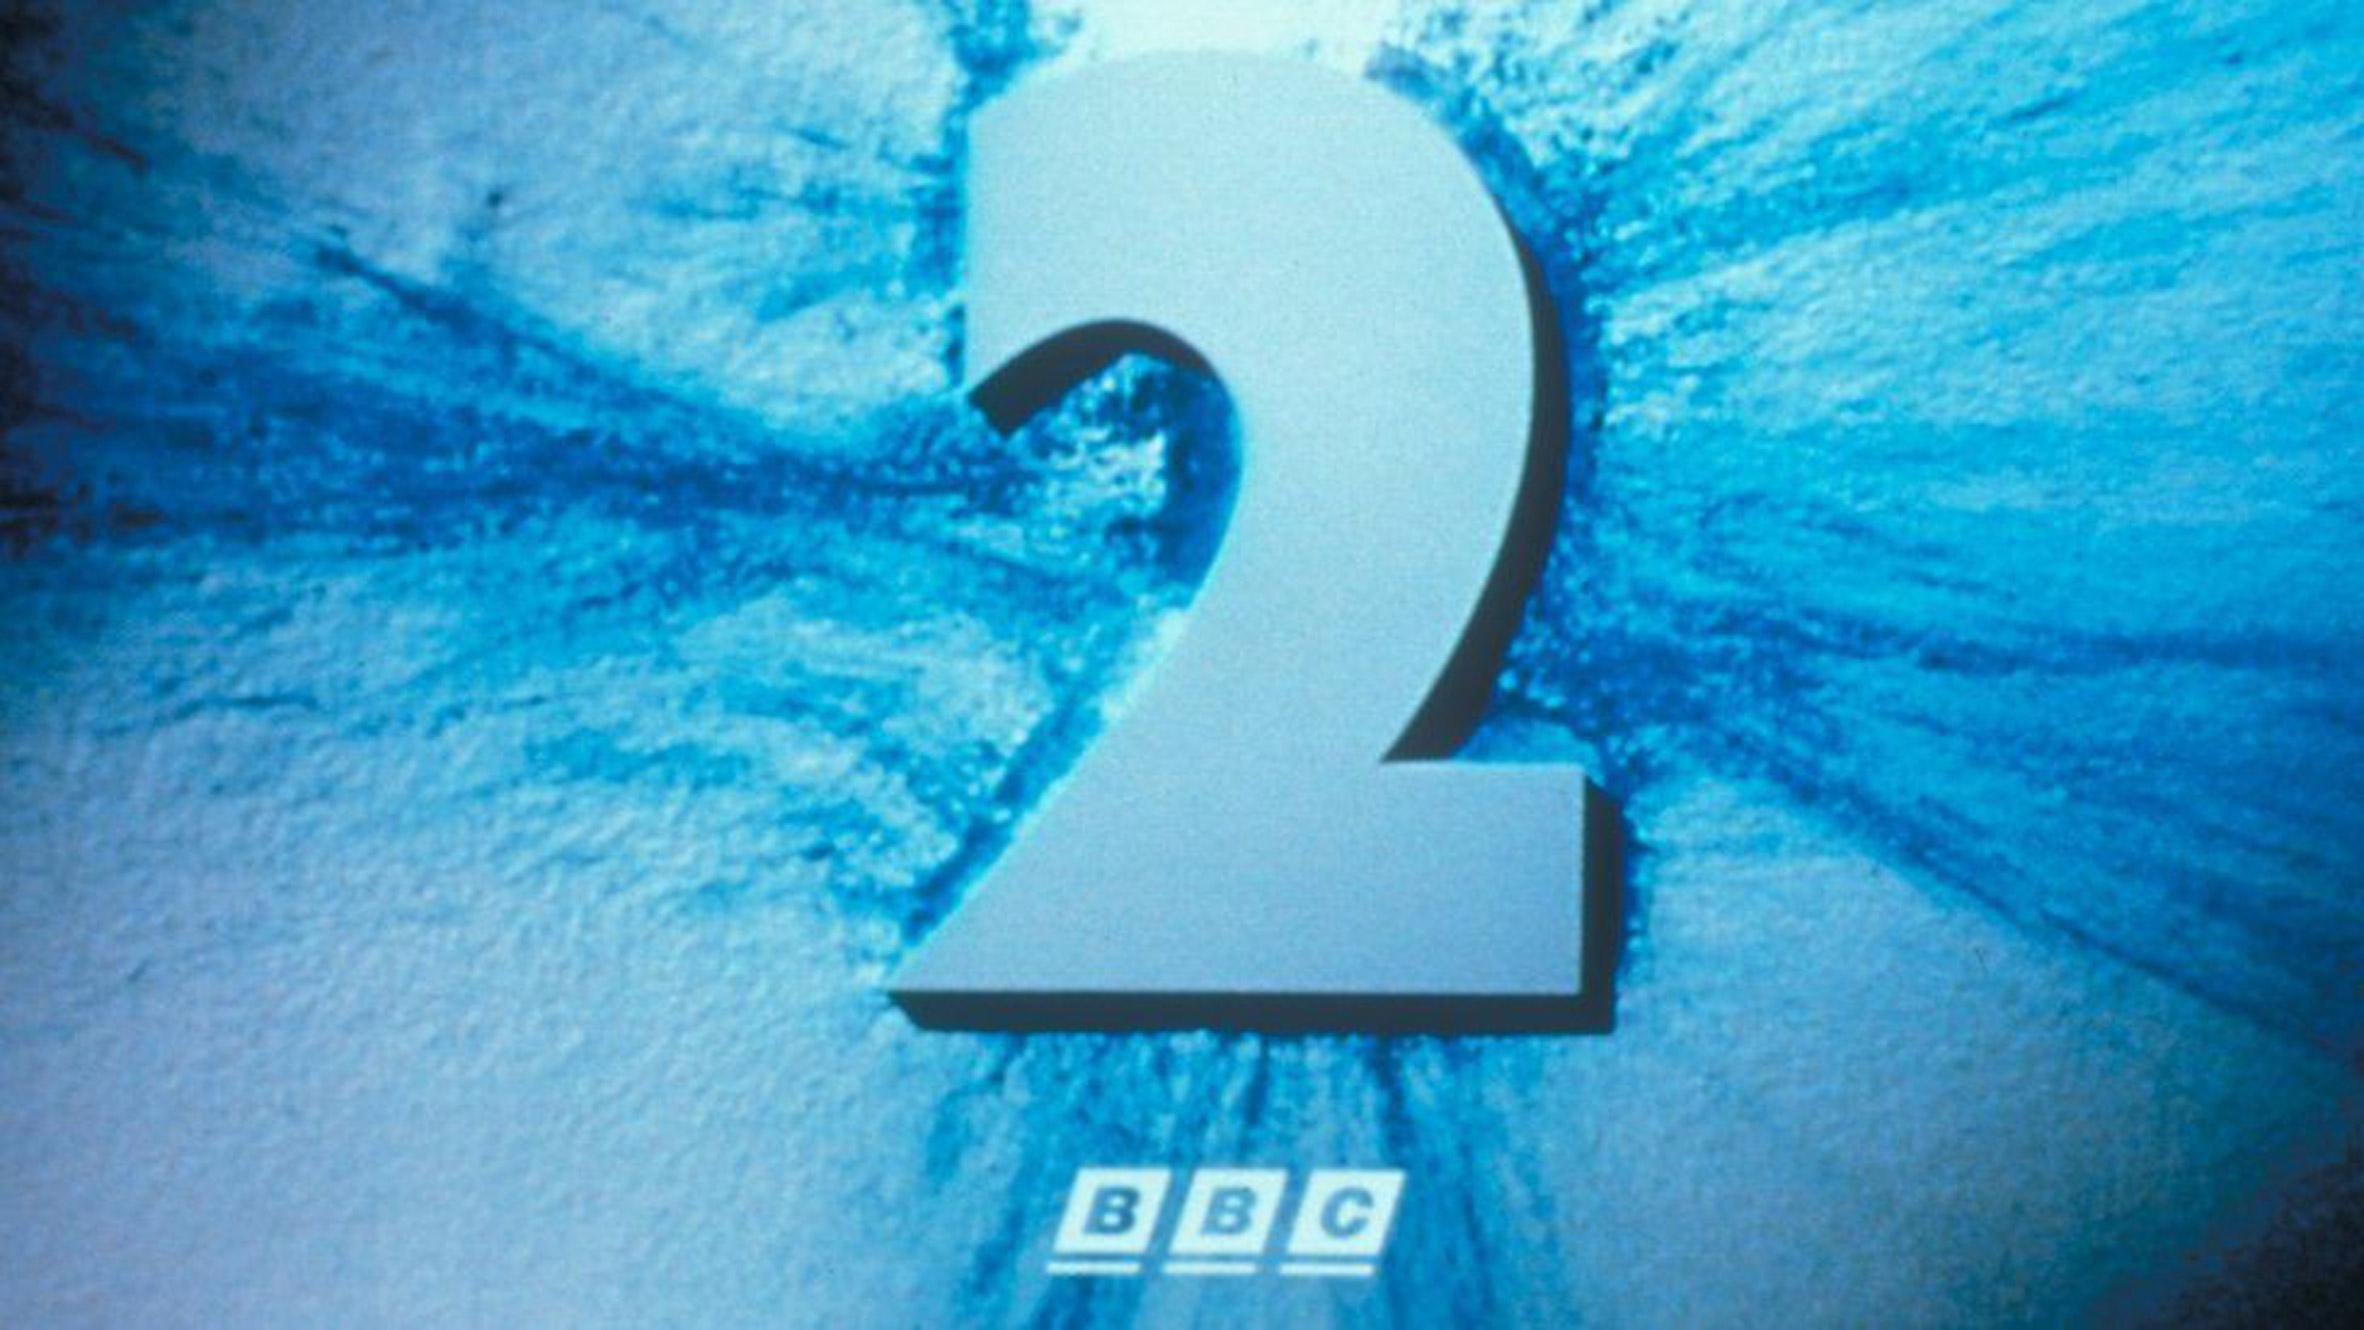 Martin Lambie_Nairn logo for the BBC